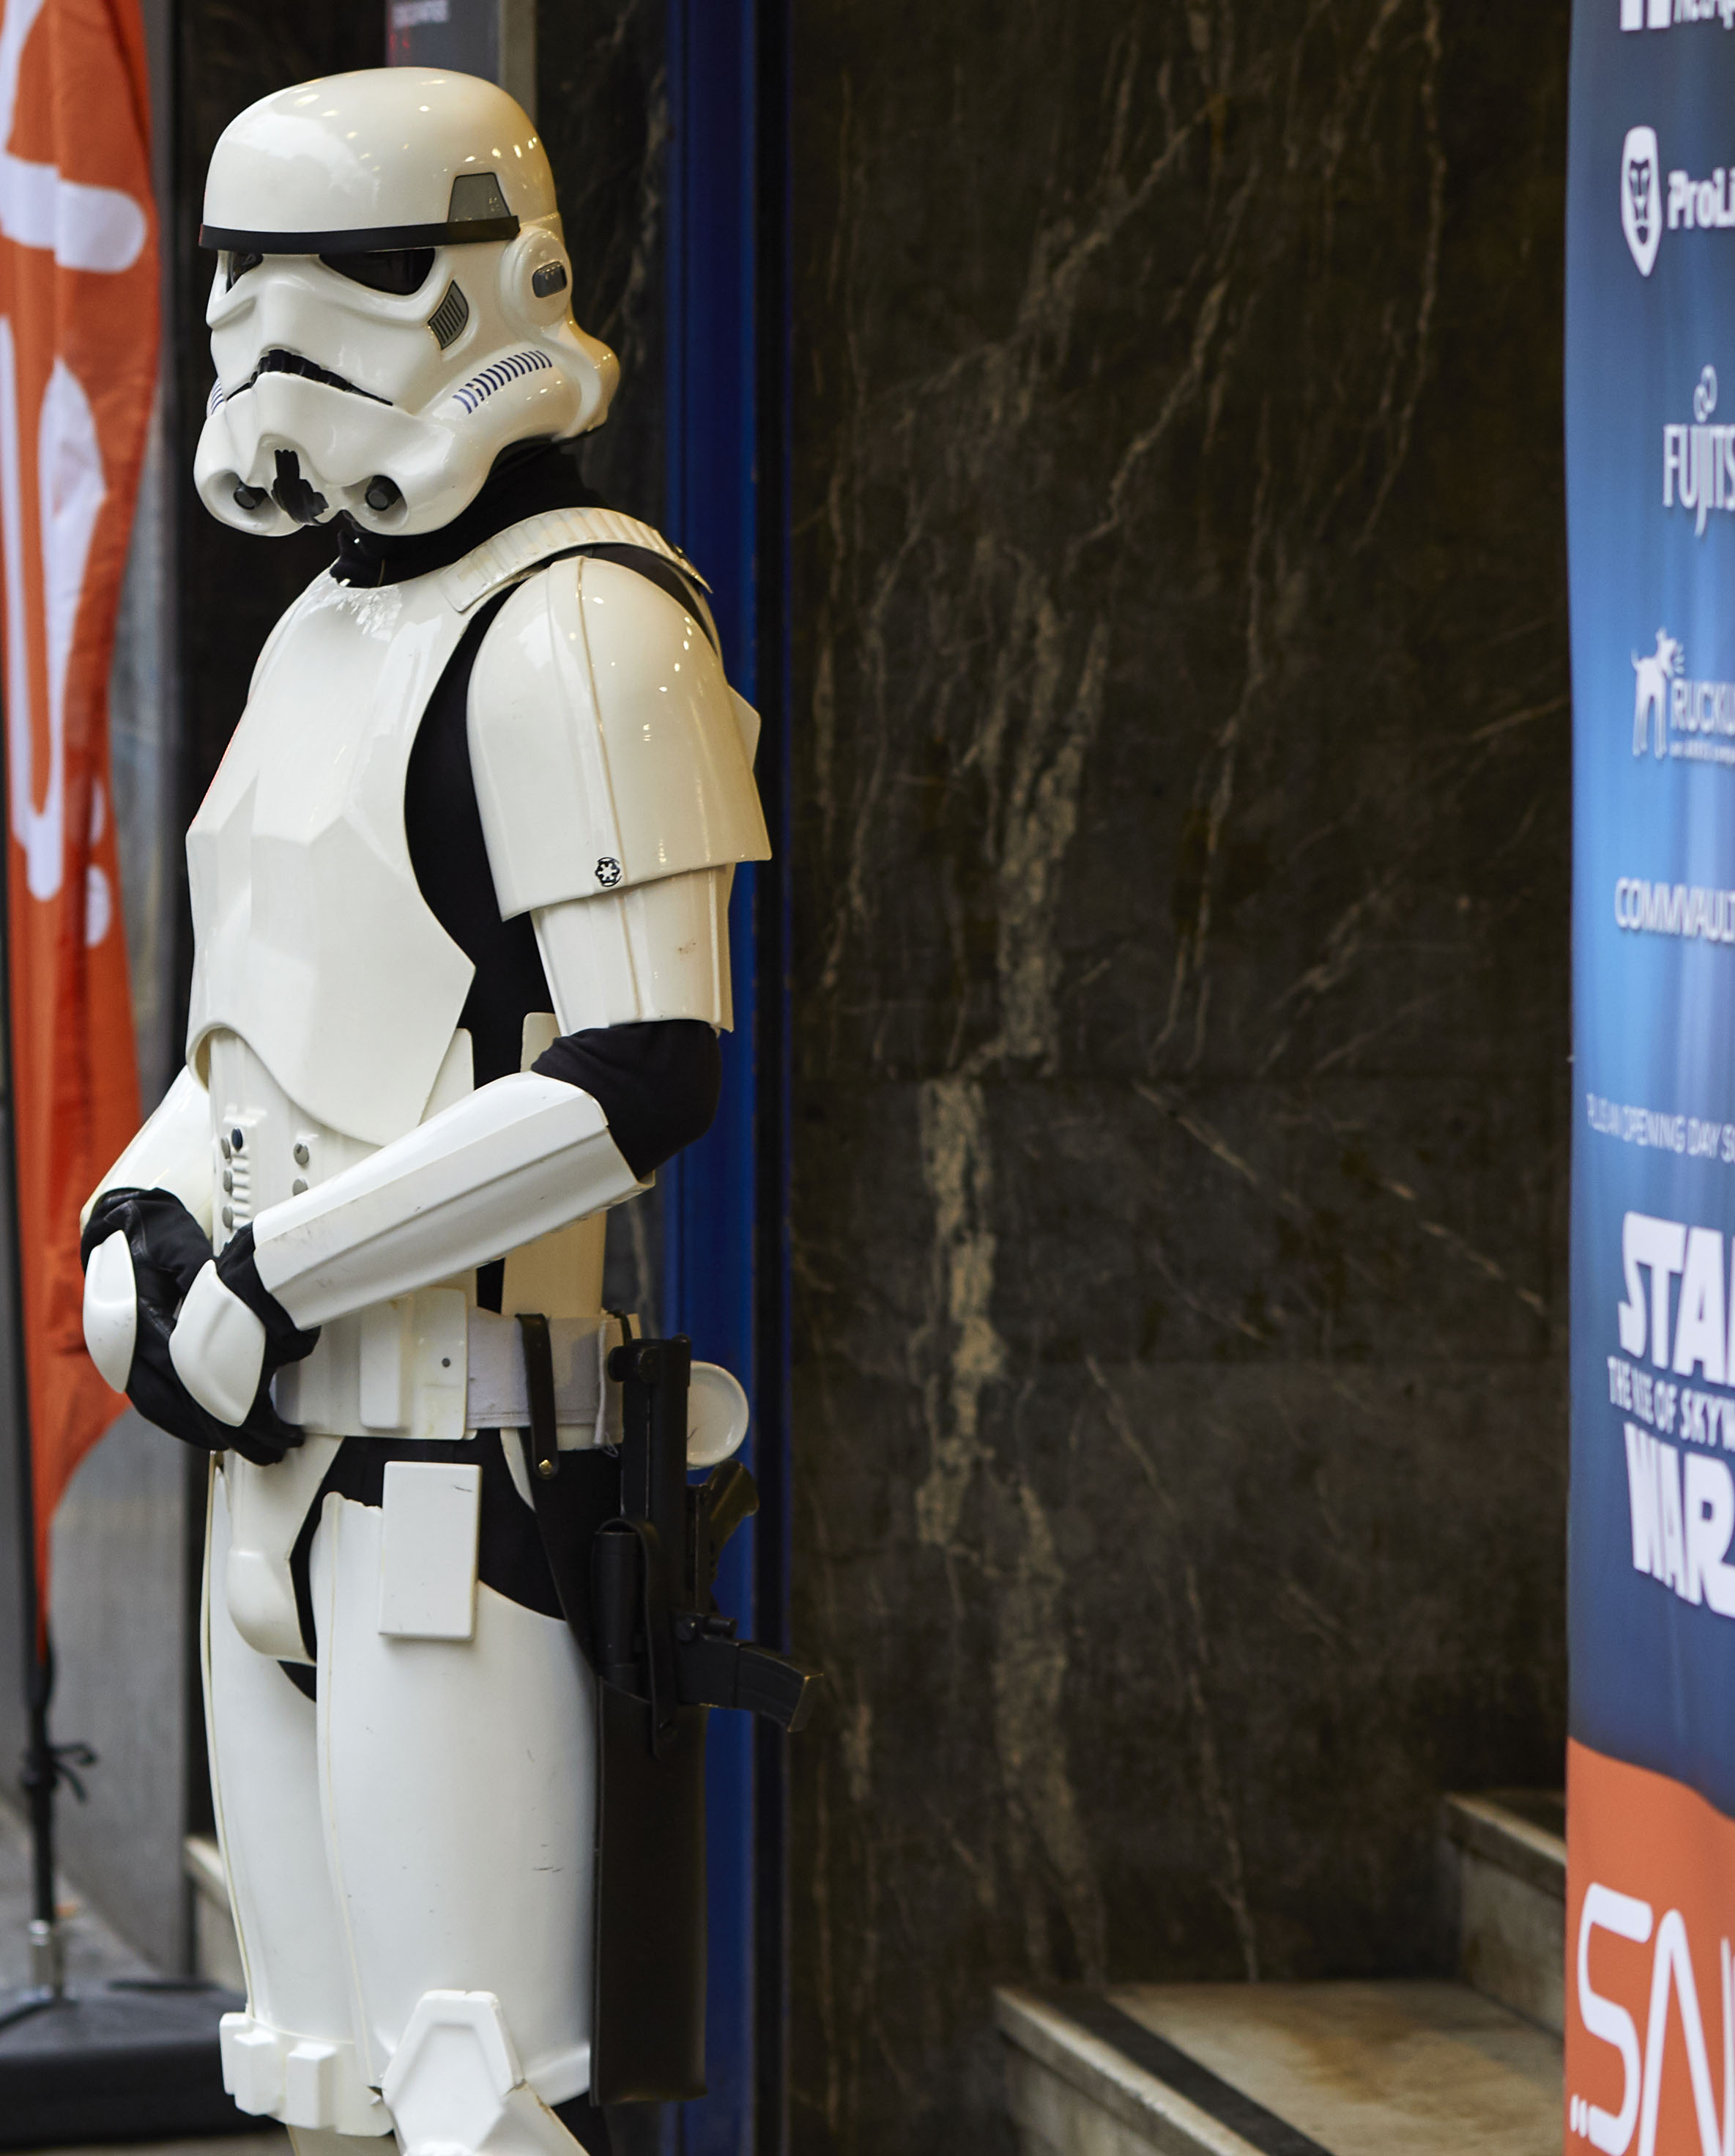 Stormtrooper at a SNS event